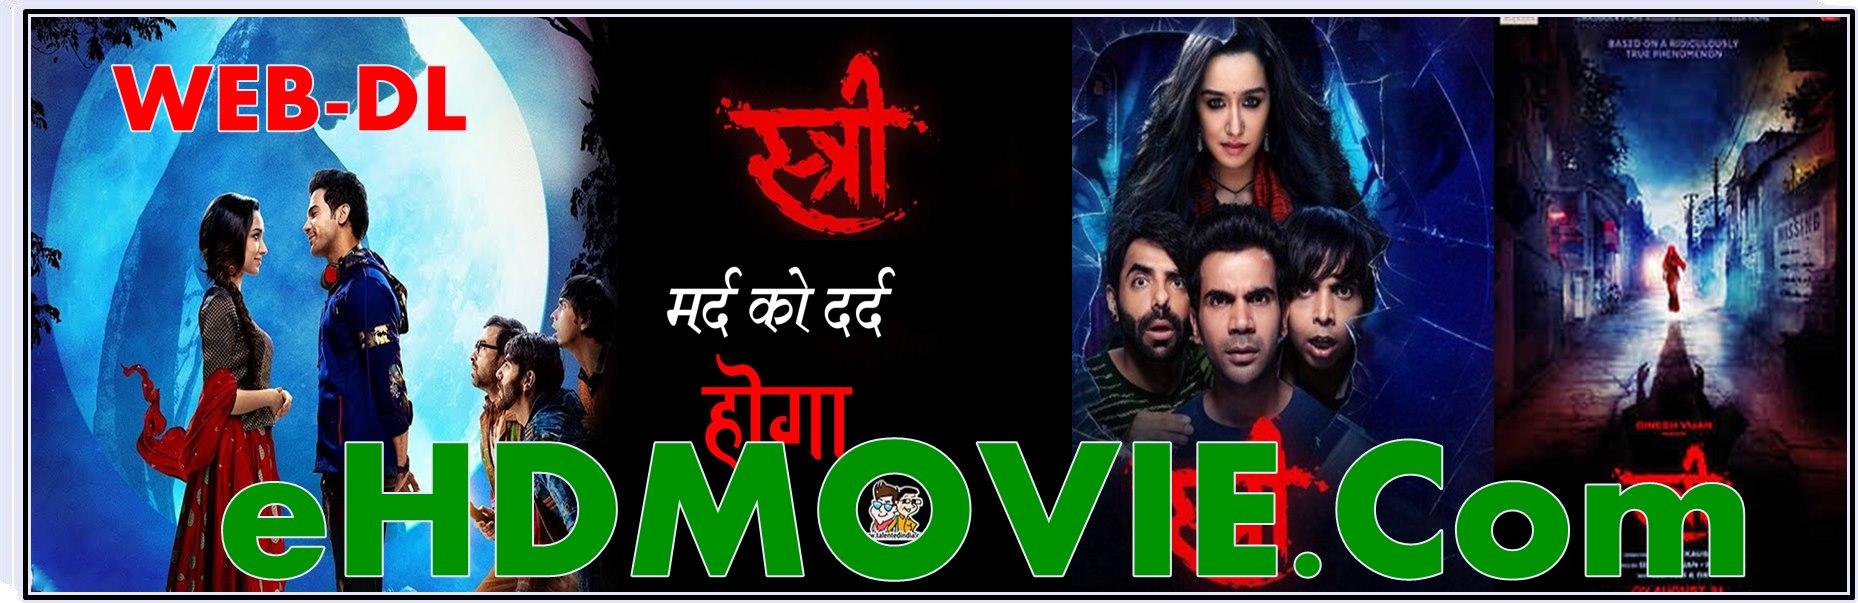 Stree 2018 Full Movie Hindi 1080p - 720p - HEVC - 480p ORG WEB-DL 400MB - 650MB - 1.3GB - 2.3GB ESubs Free Download